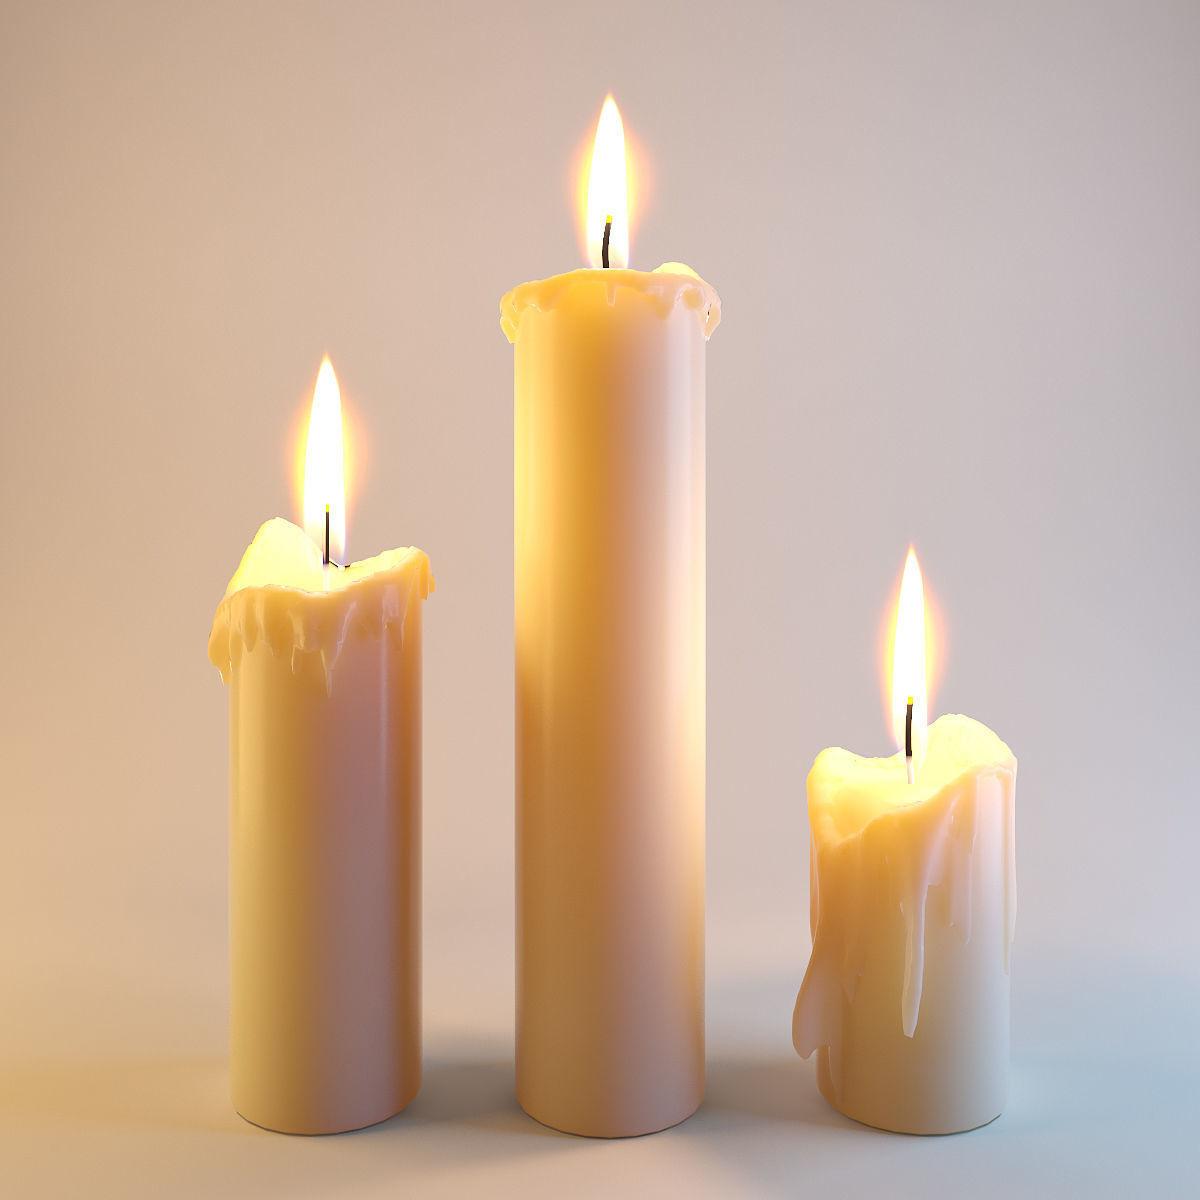 Candle Light - True_George